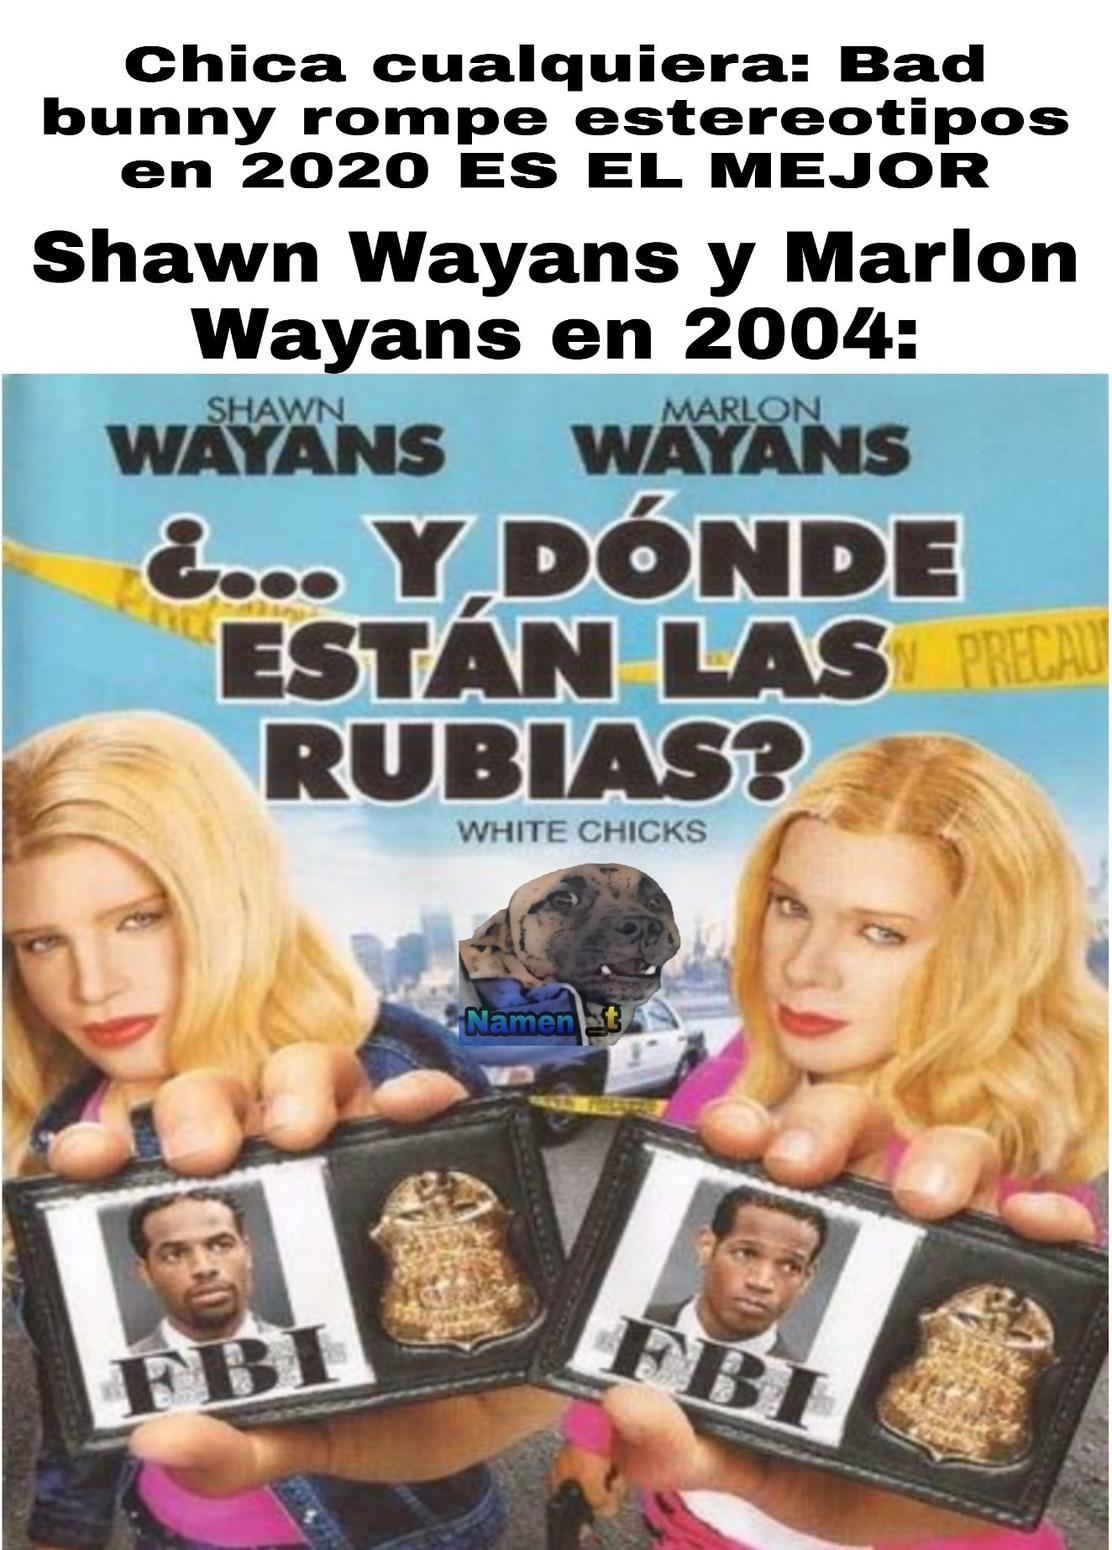 Si no te gusta esta película te la comes doblada - meme